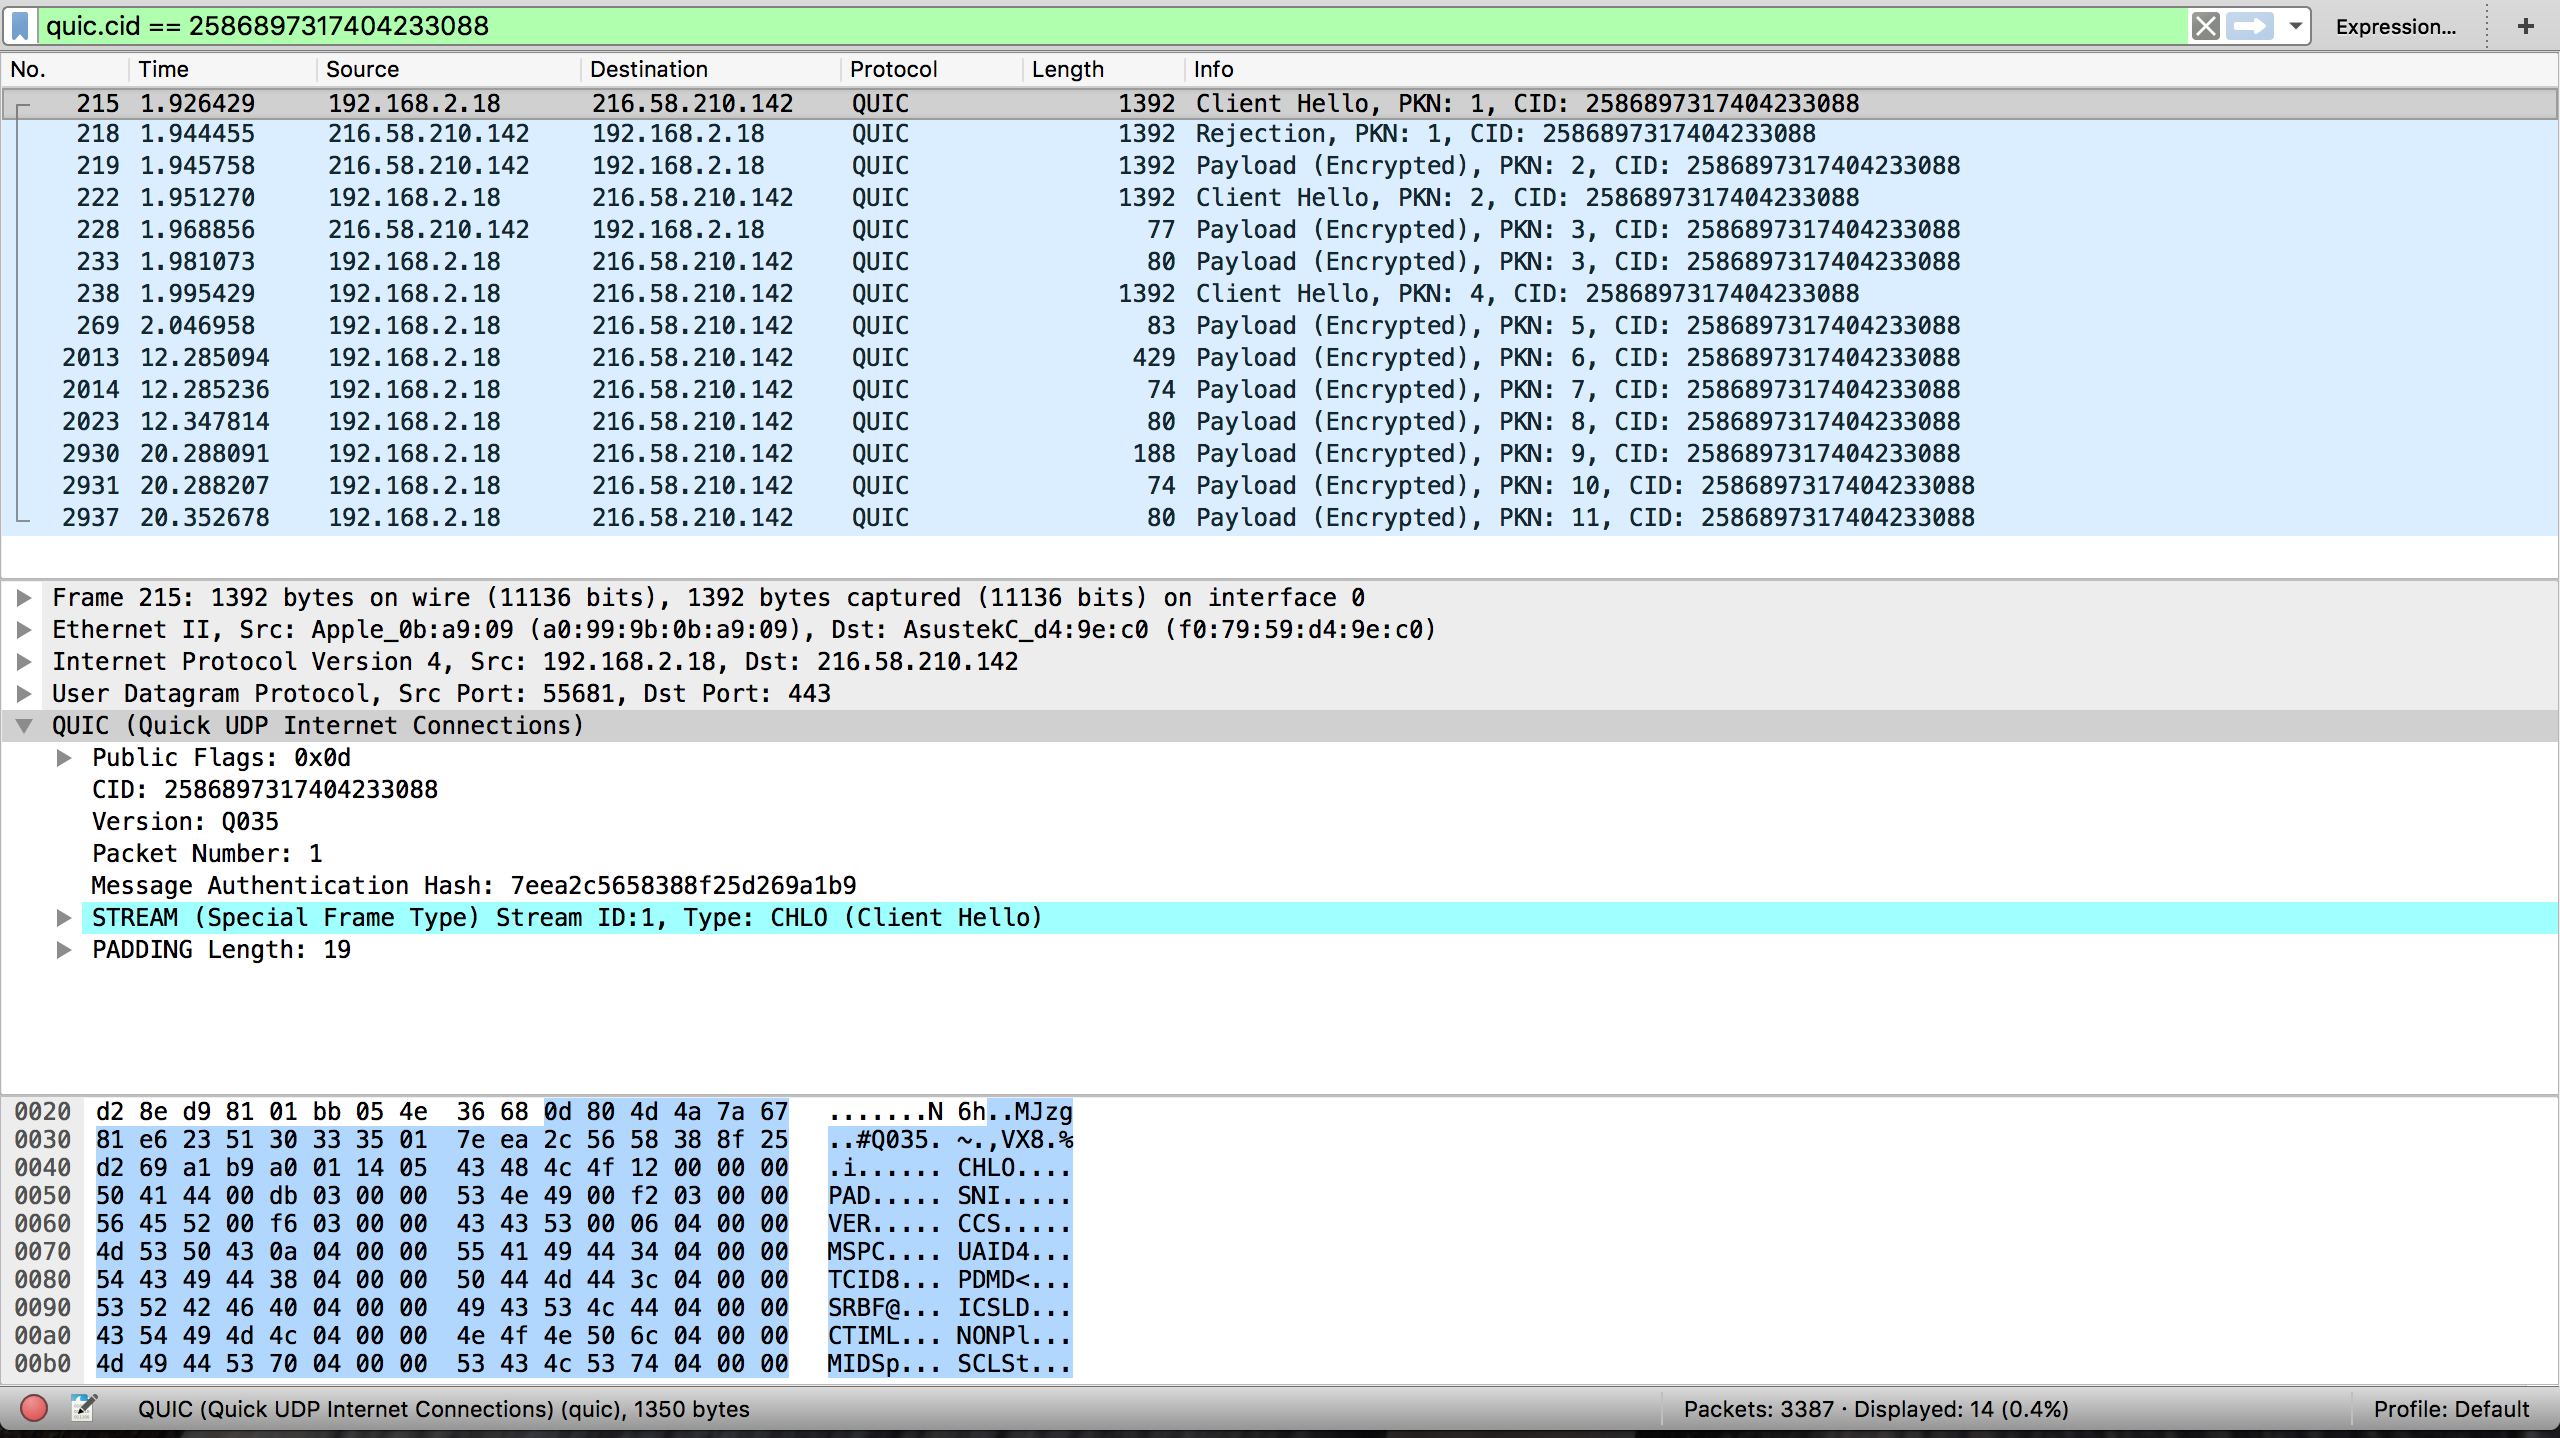 Wiereshark screenshot that shows QUIC packets